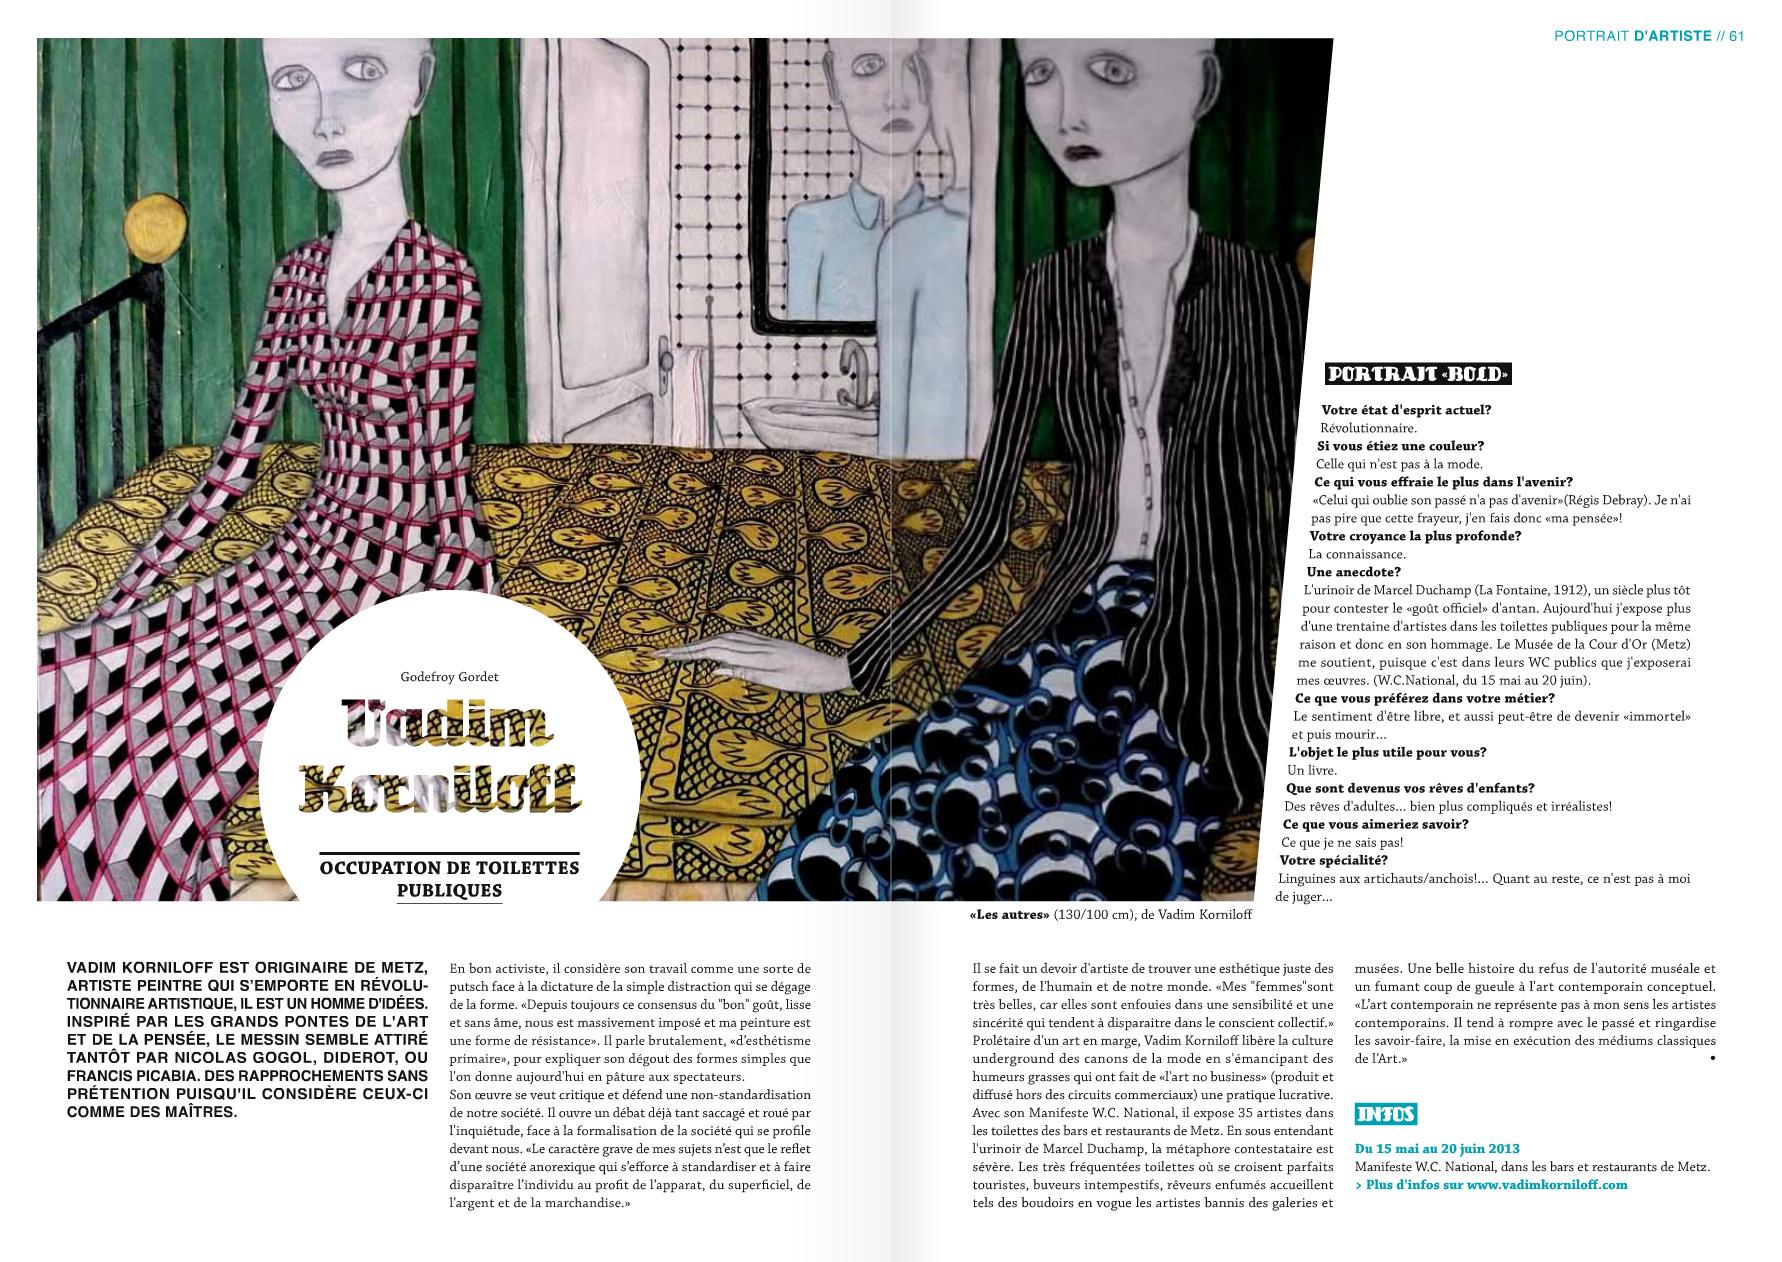 BOLD article JUIN 2013